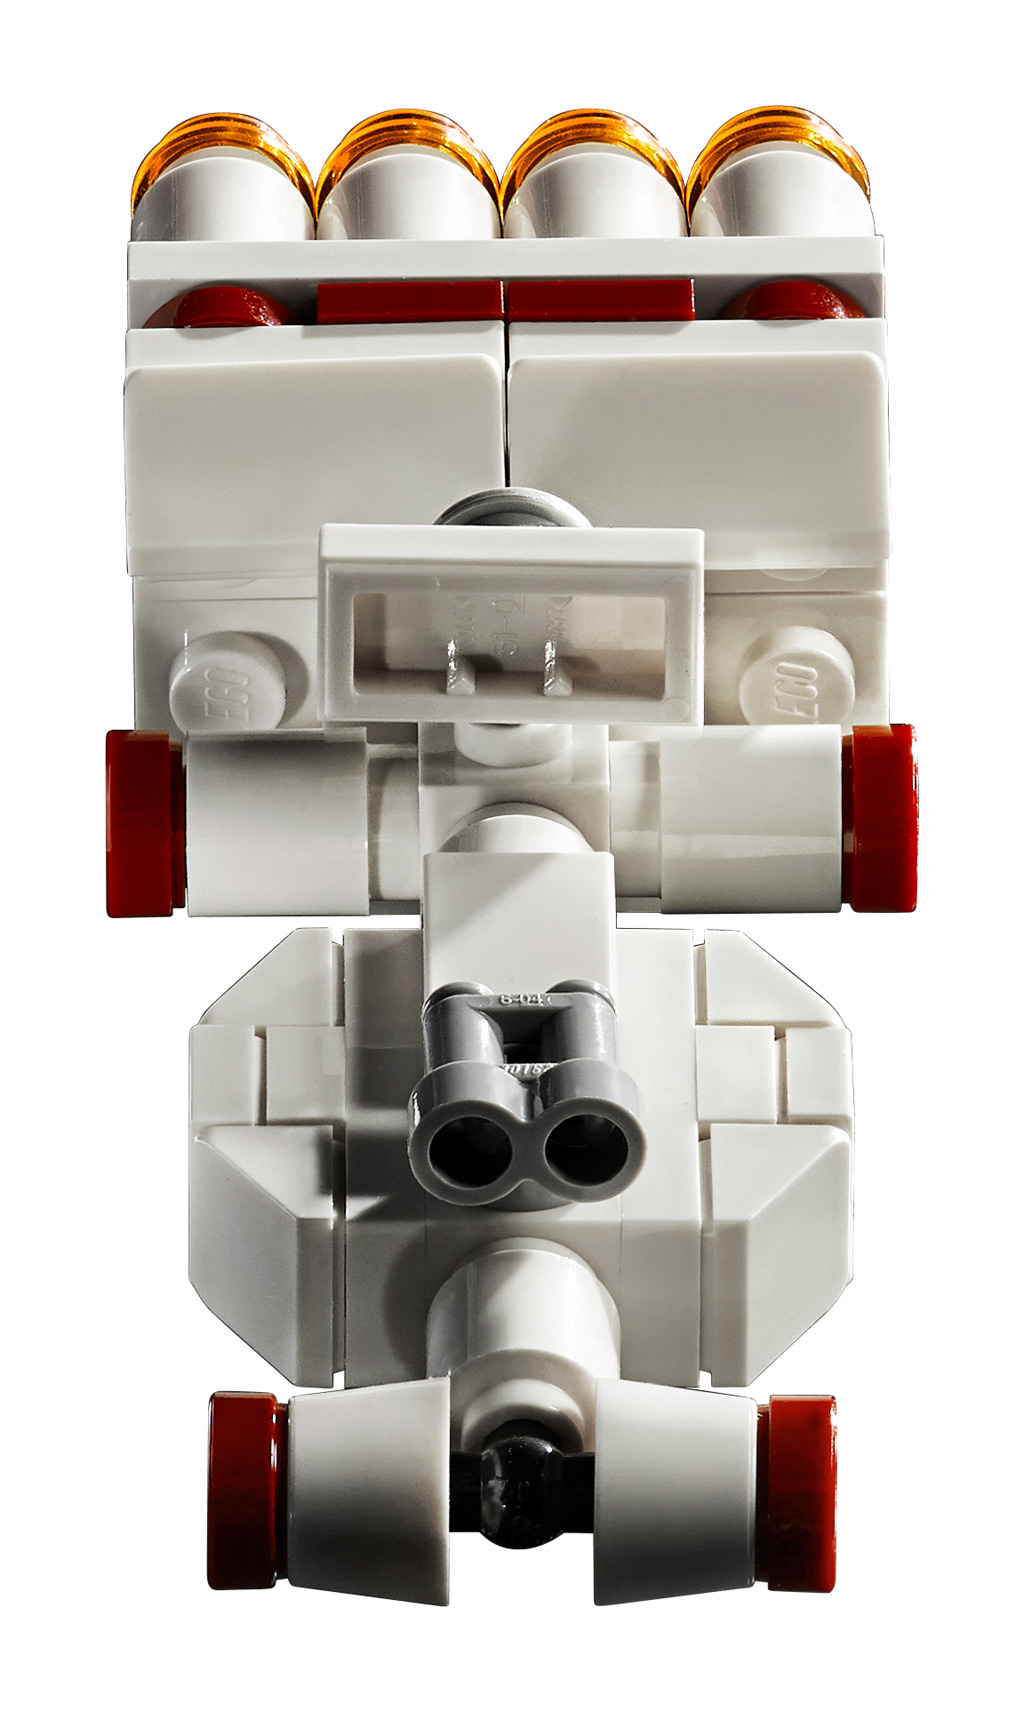 lego-star-wars-75252-ucs-imperial-star-destroyer-2019-tantive-v-front-ansicht zusammengebaut.com